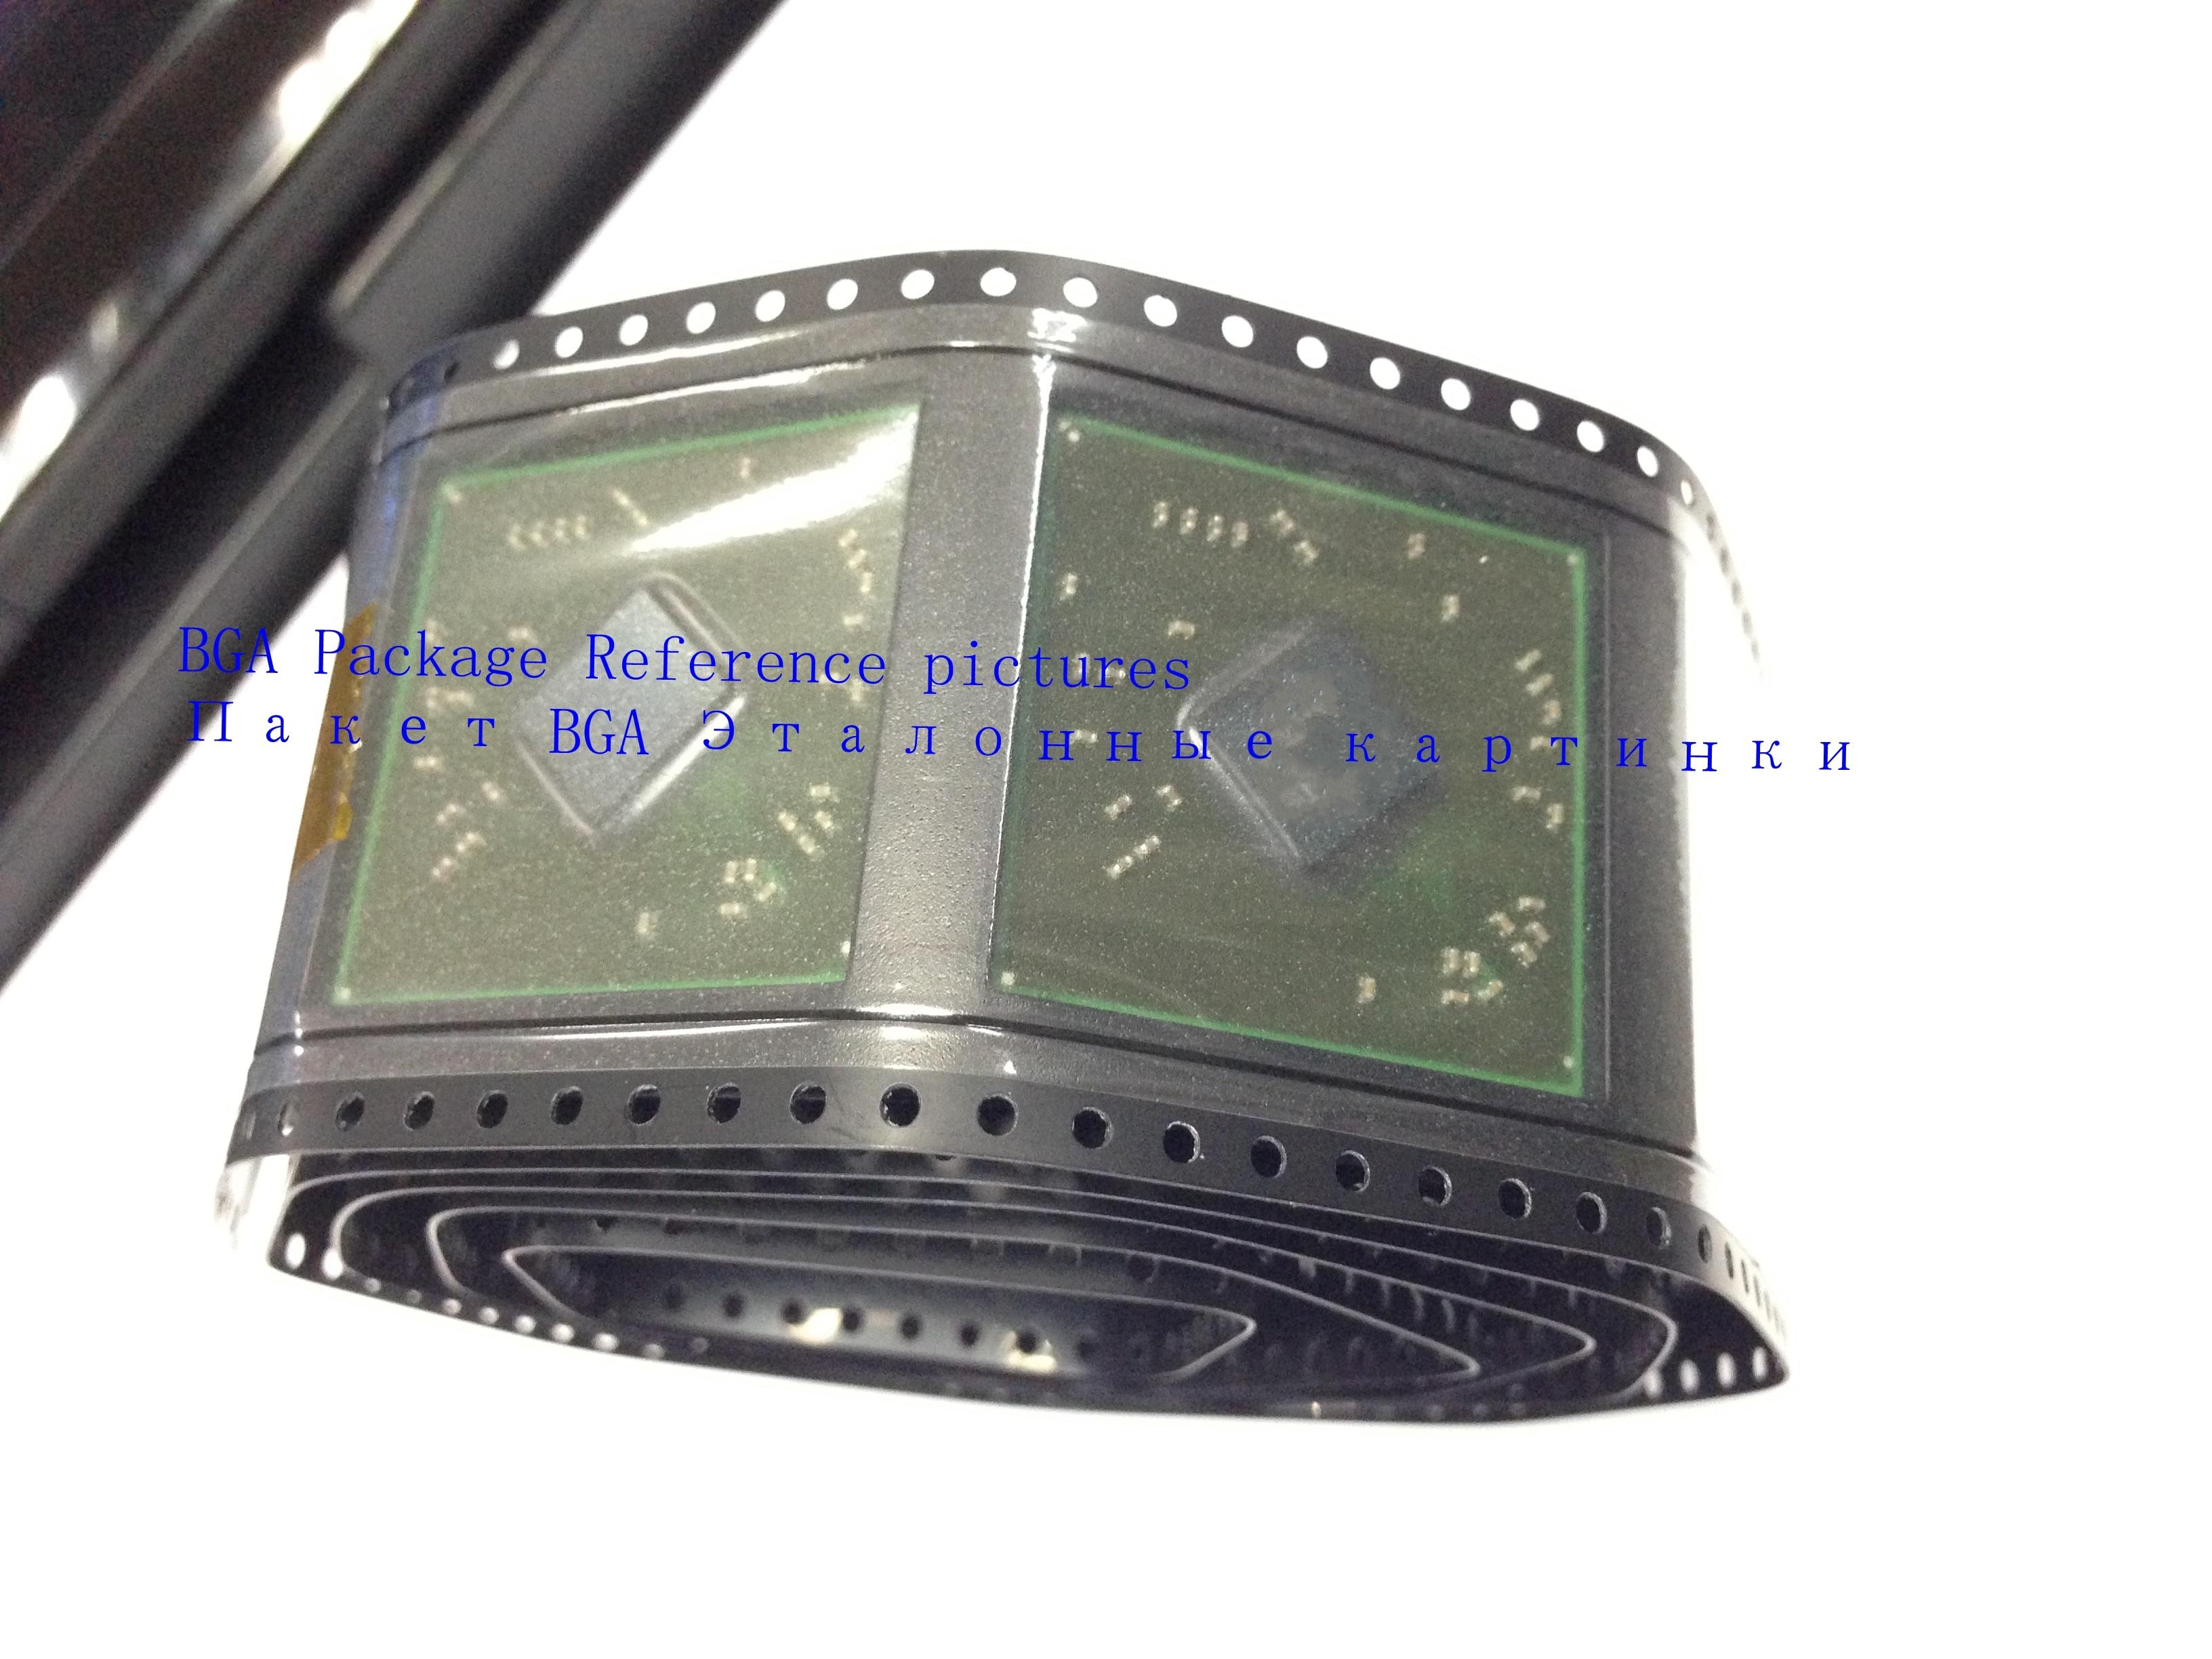 1pcs/lot 100% New NF-7025-630-N-A3 NF 7025 630 N A3 BGA Chipset1pcs/lot 100% New NF-7025-630-N-A3 NF 7025 630 N A3 BGA Chipset